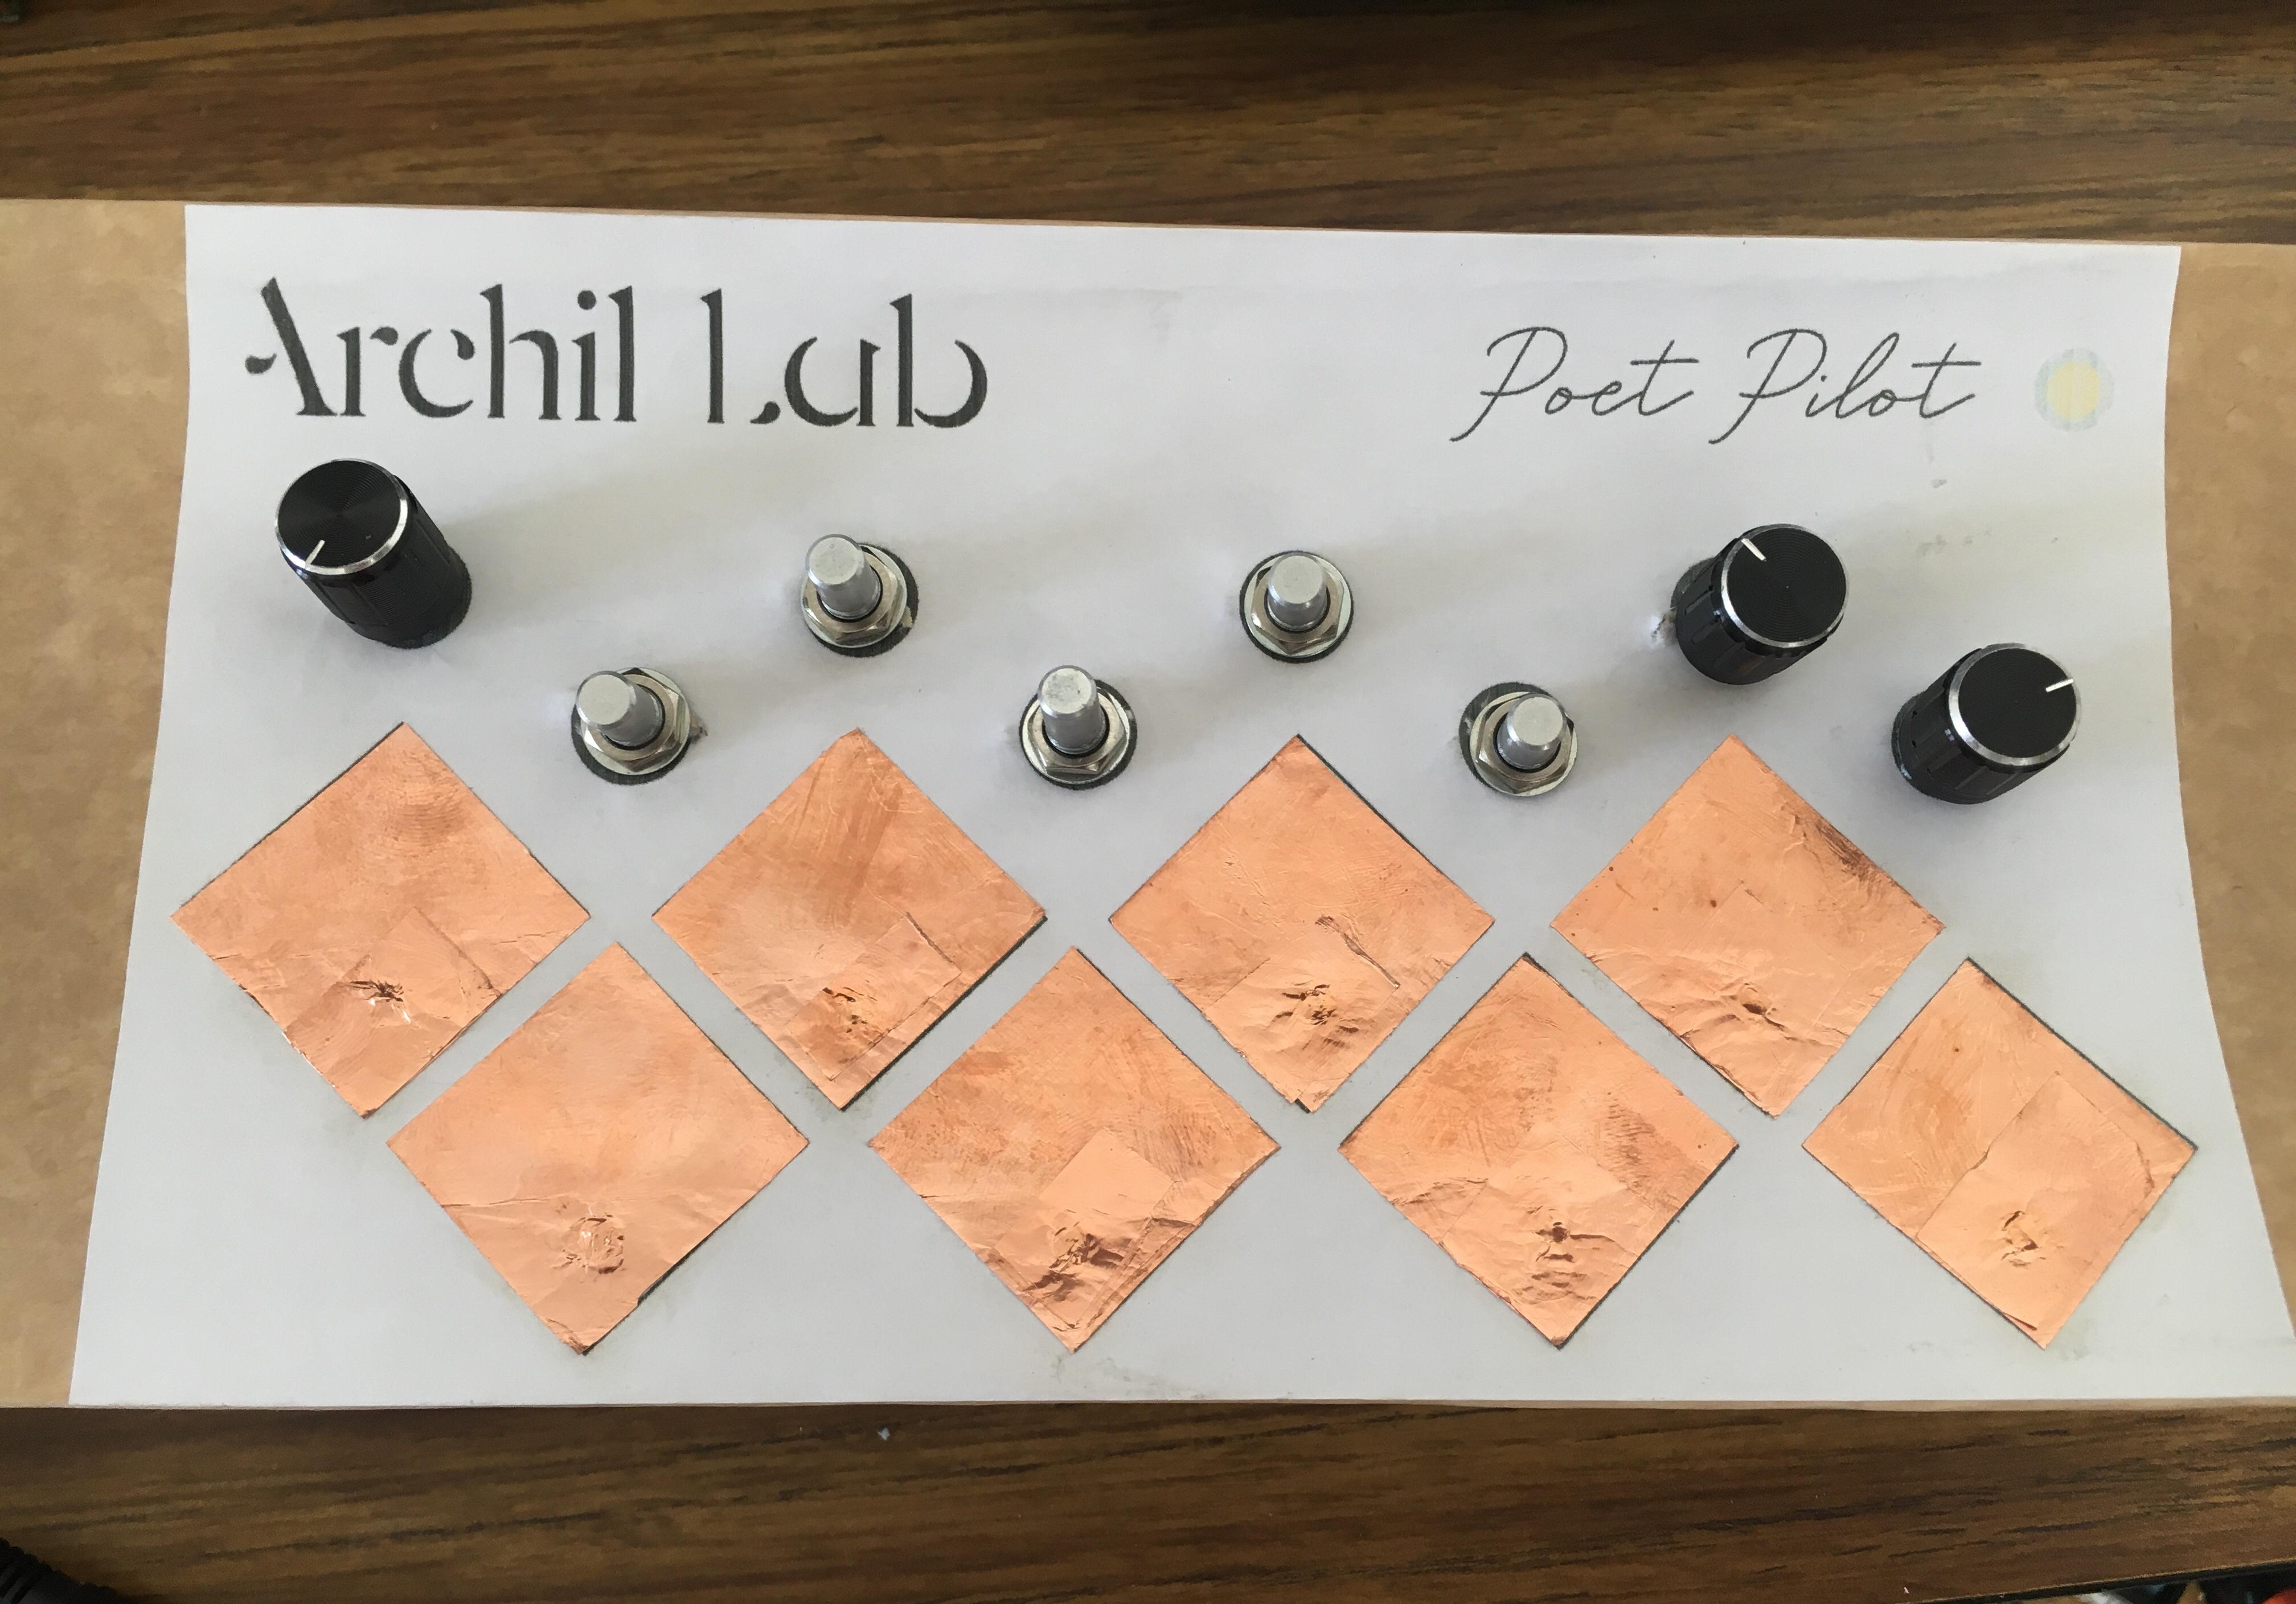 Archil Lab // Poet Pilot // Cardboard prototype